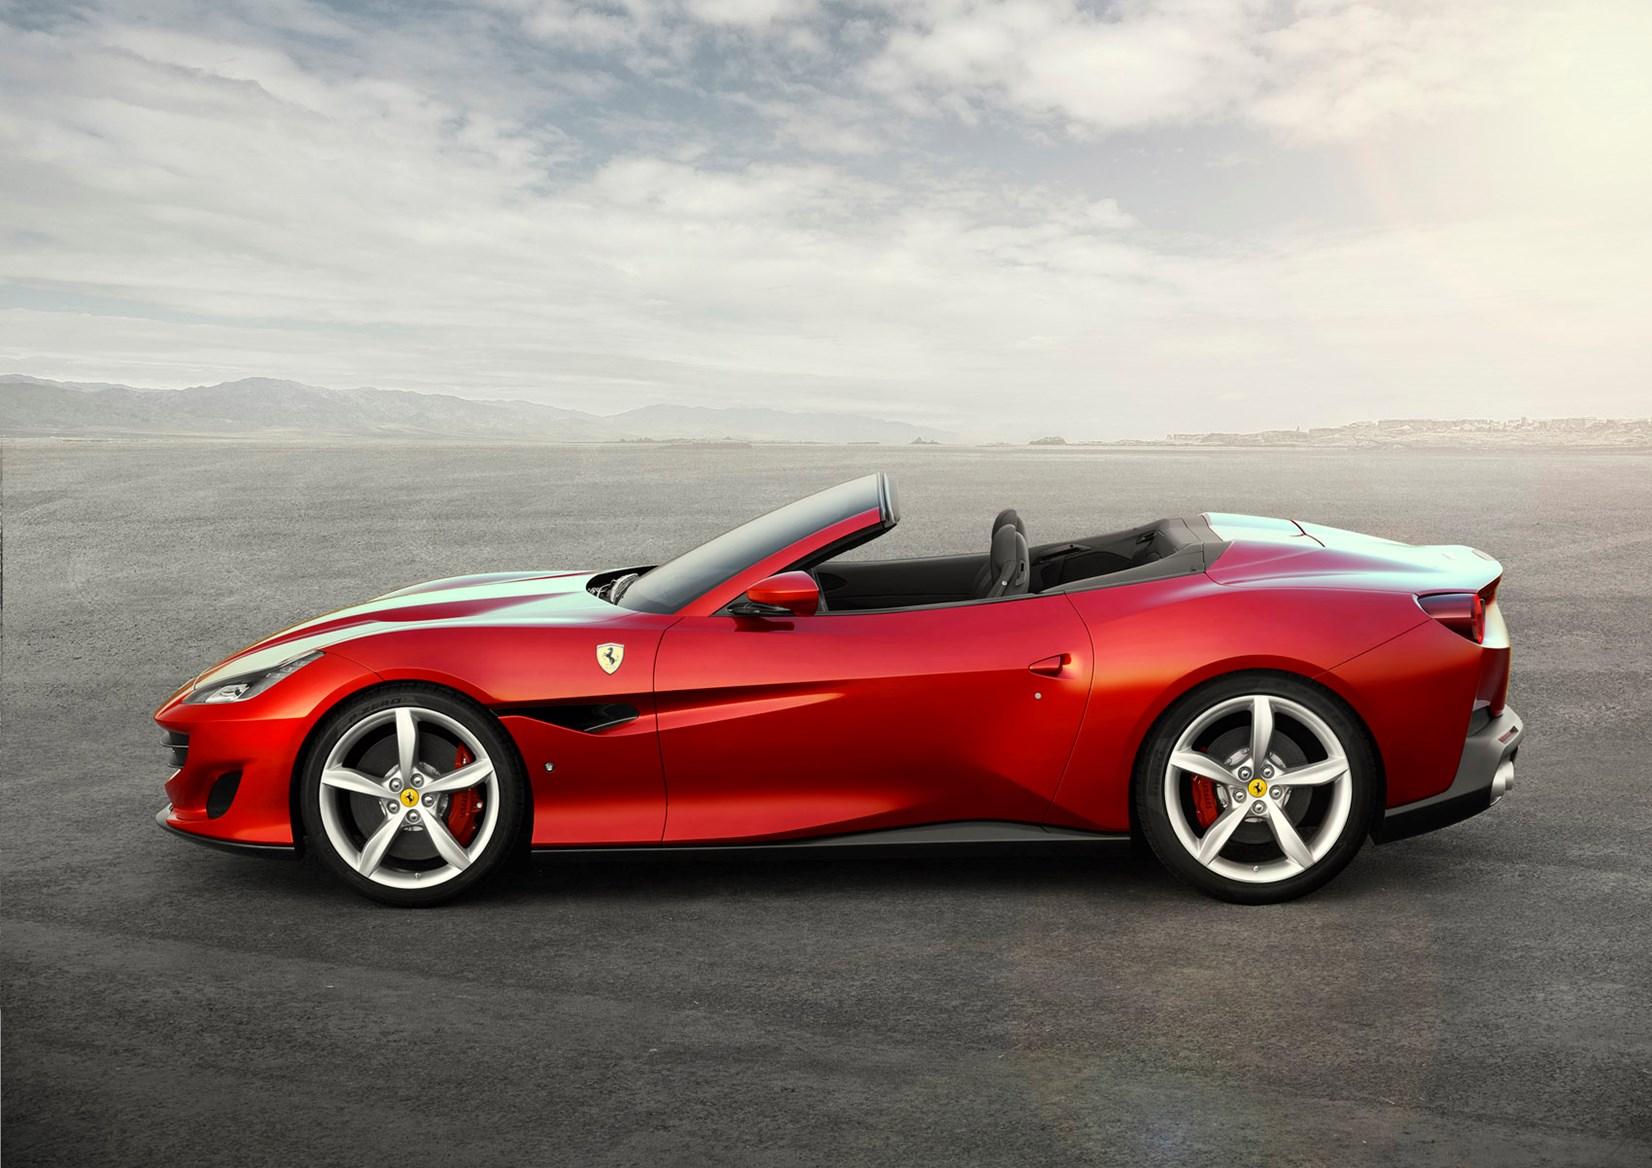 ferrari portofino review: running costs | parkers